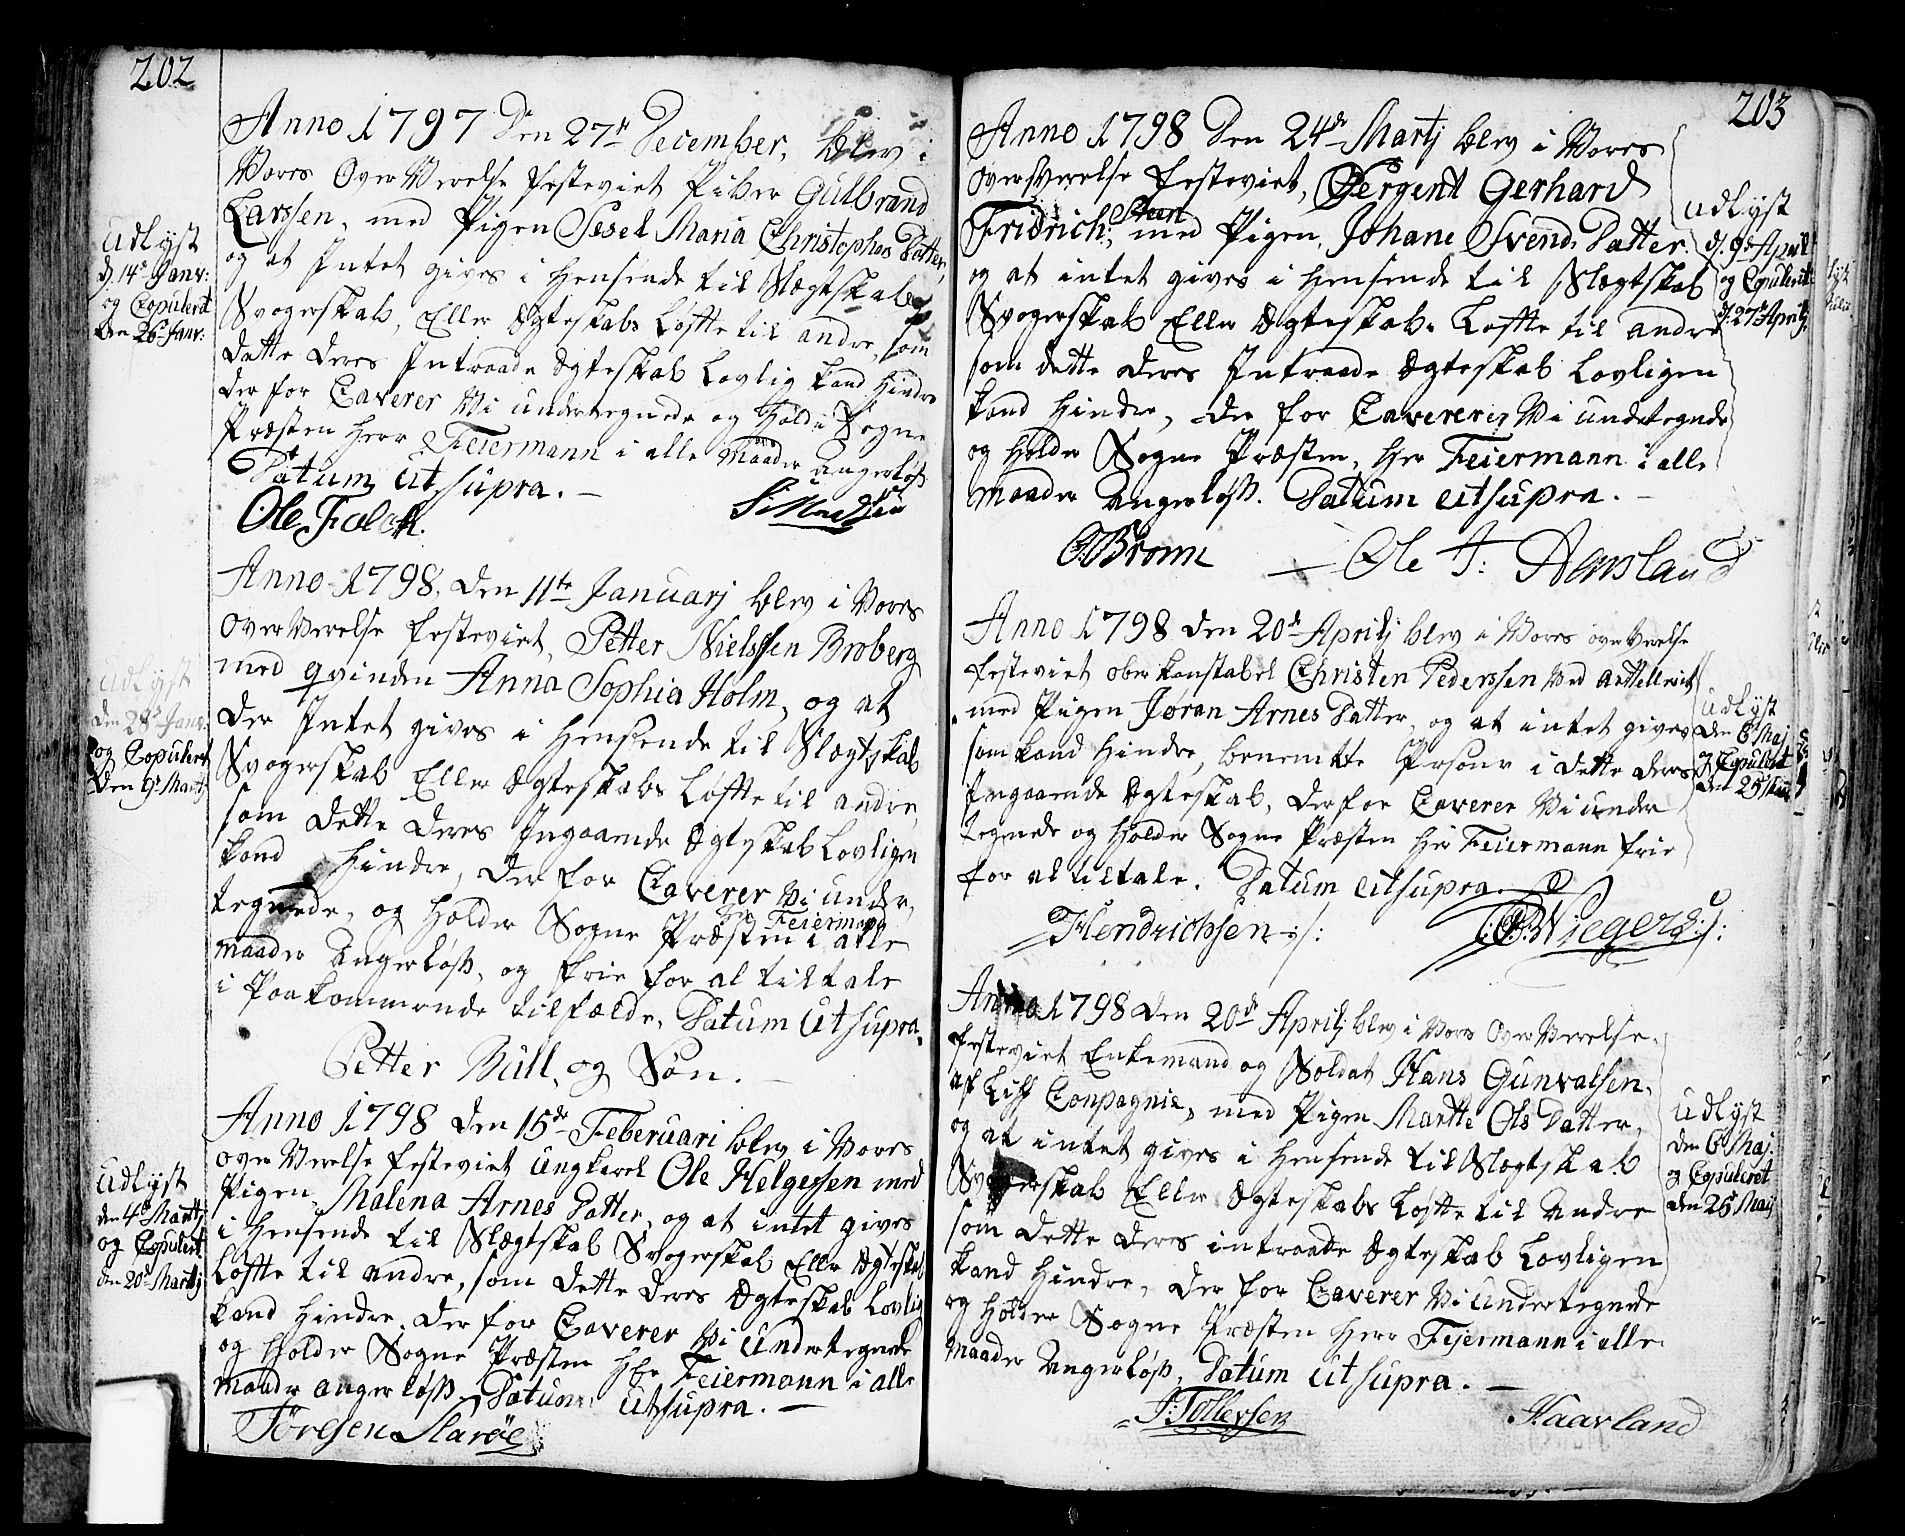 SAO, Fredrikstad prestekontor Kirkebøker, F/Fa/L0002: Ministerialbok nr. 2, 1750-1804, s. 202-203